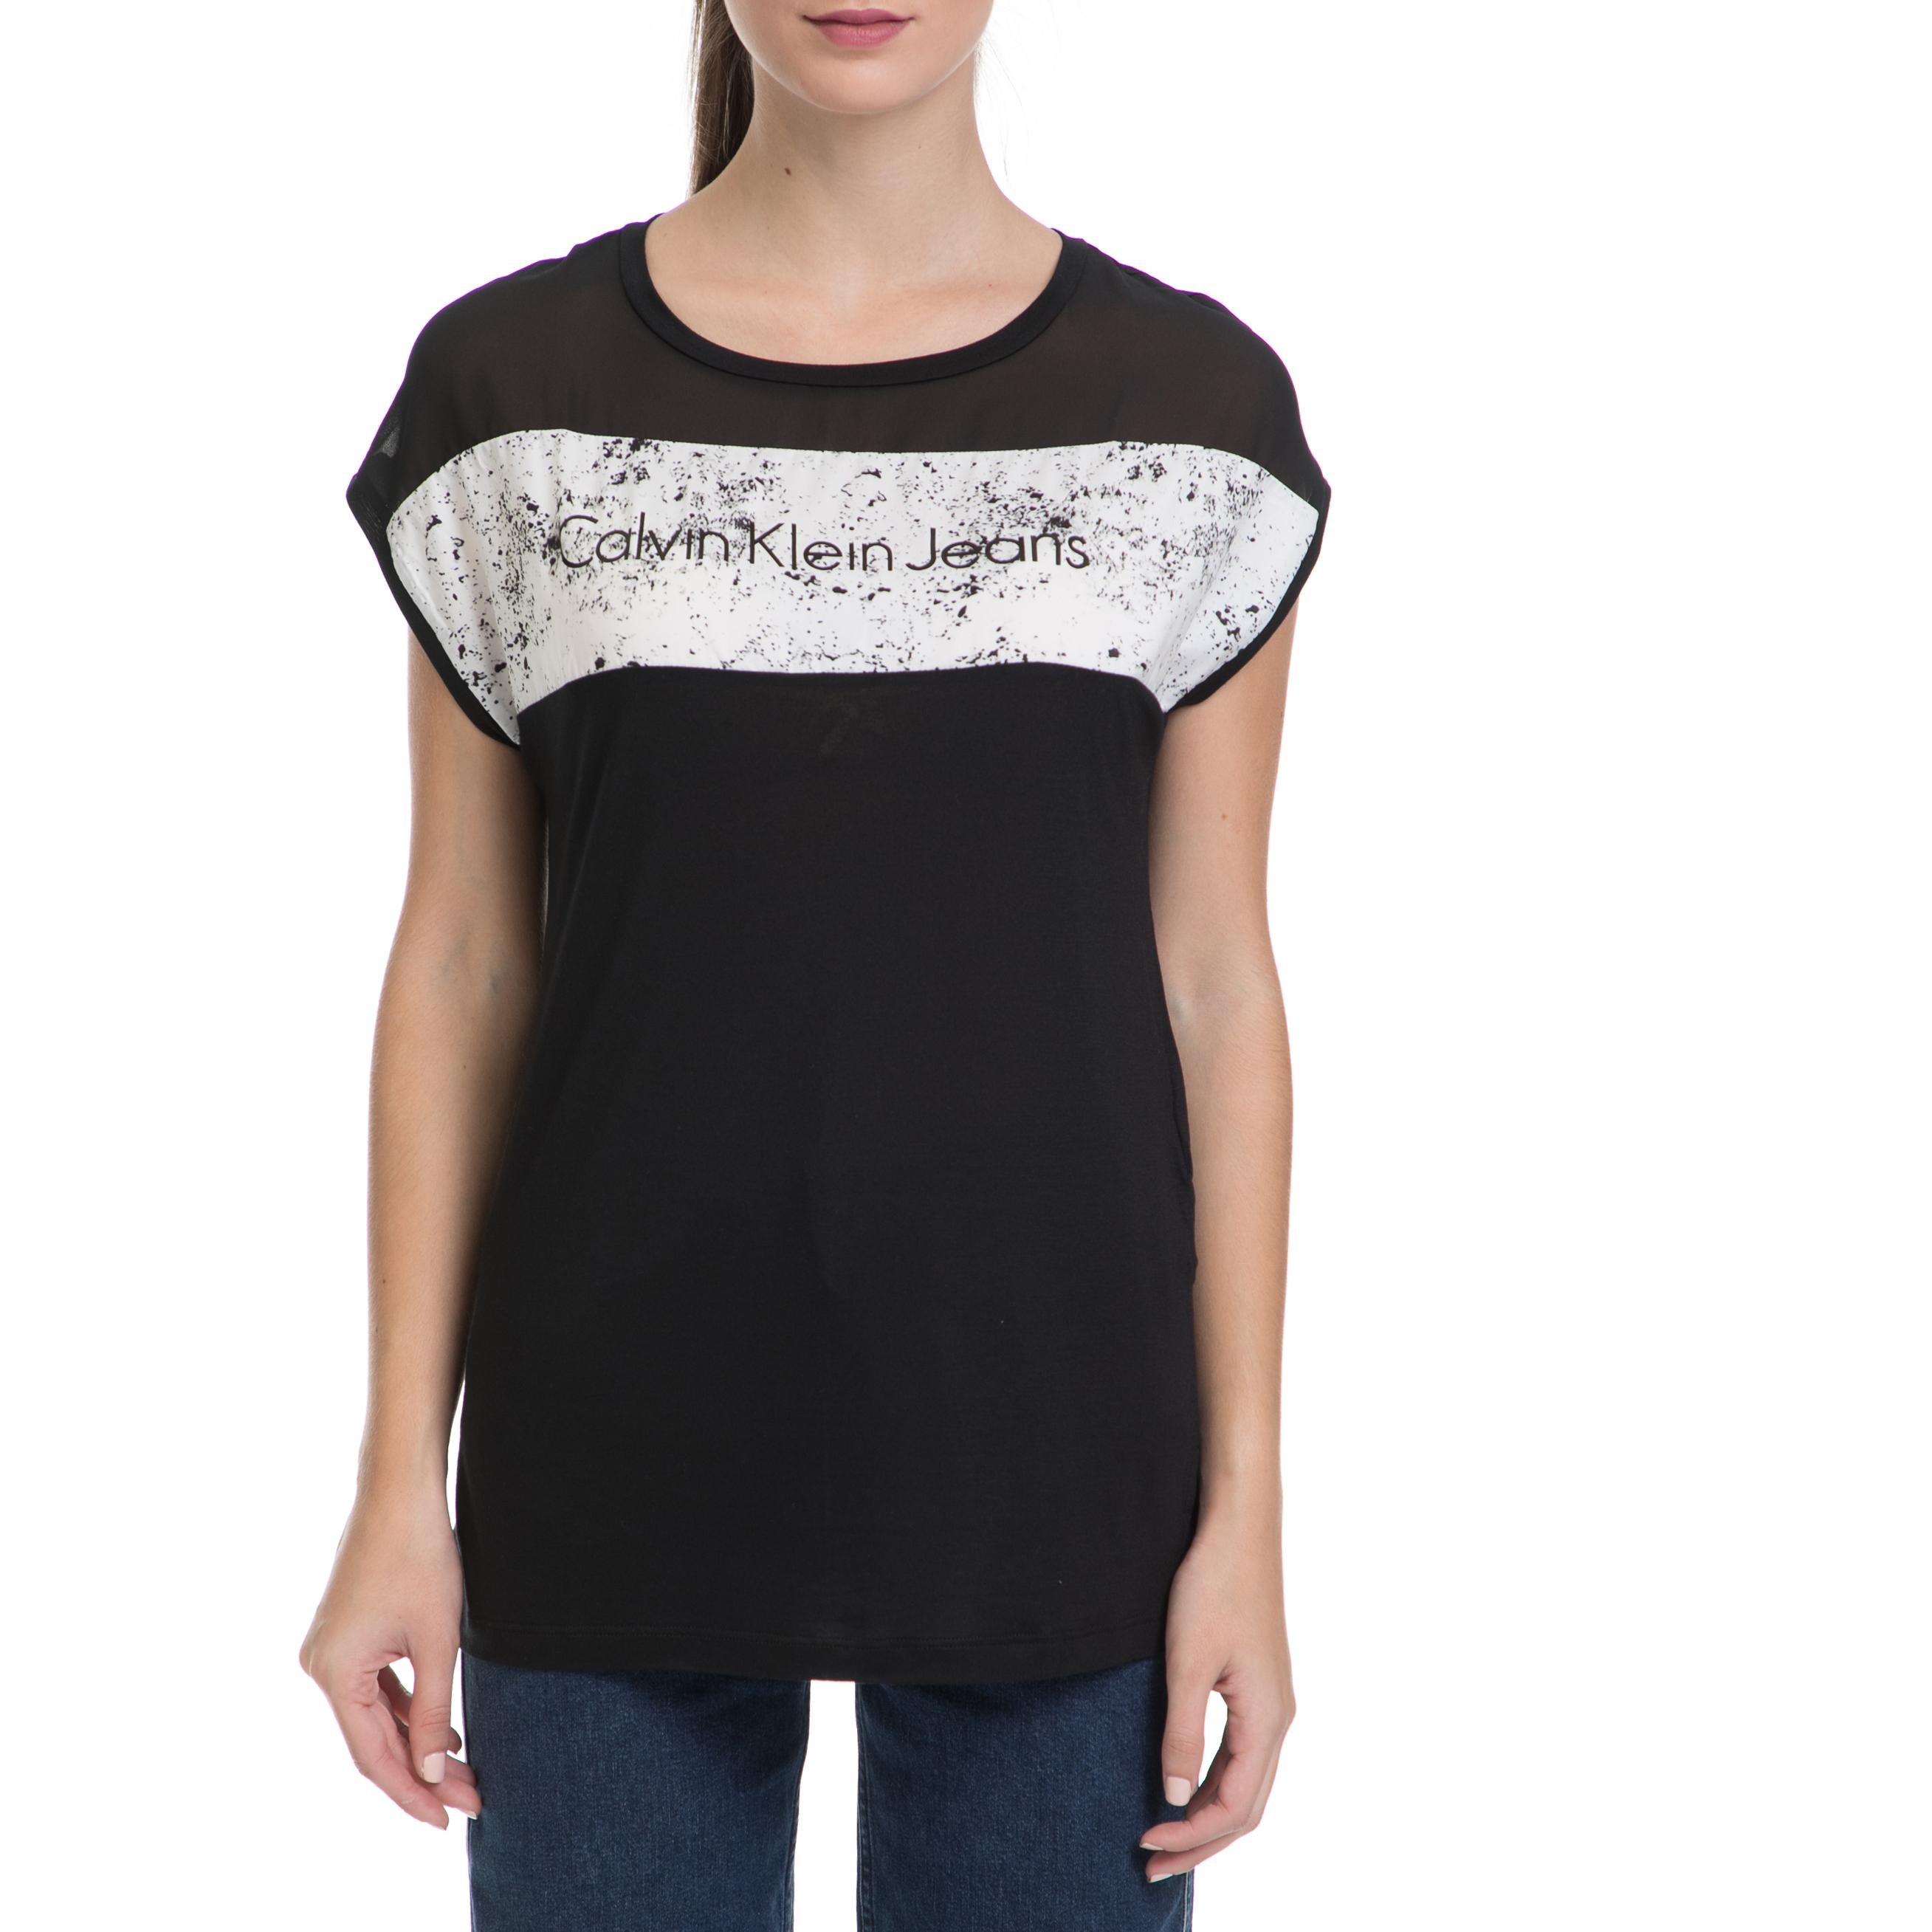 CALVIN KLEIN JEANS – Γυναικεία μπλούζα TIKA-31 CN LWK μαύρη